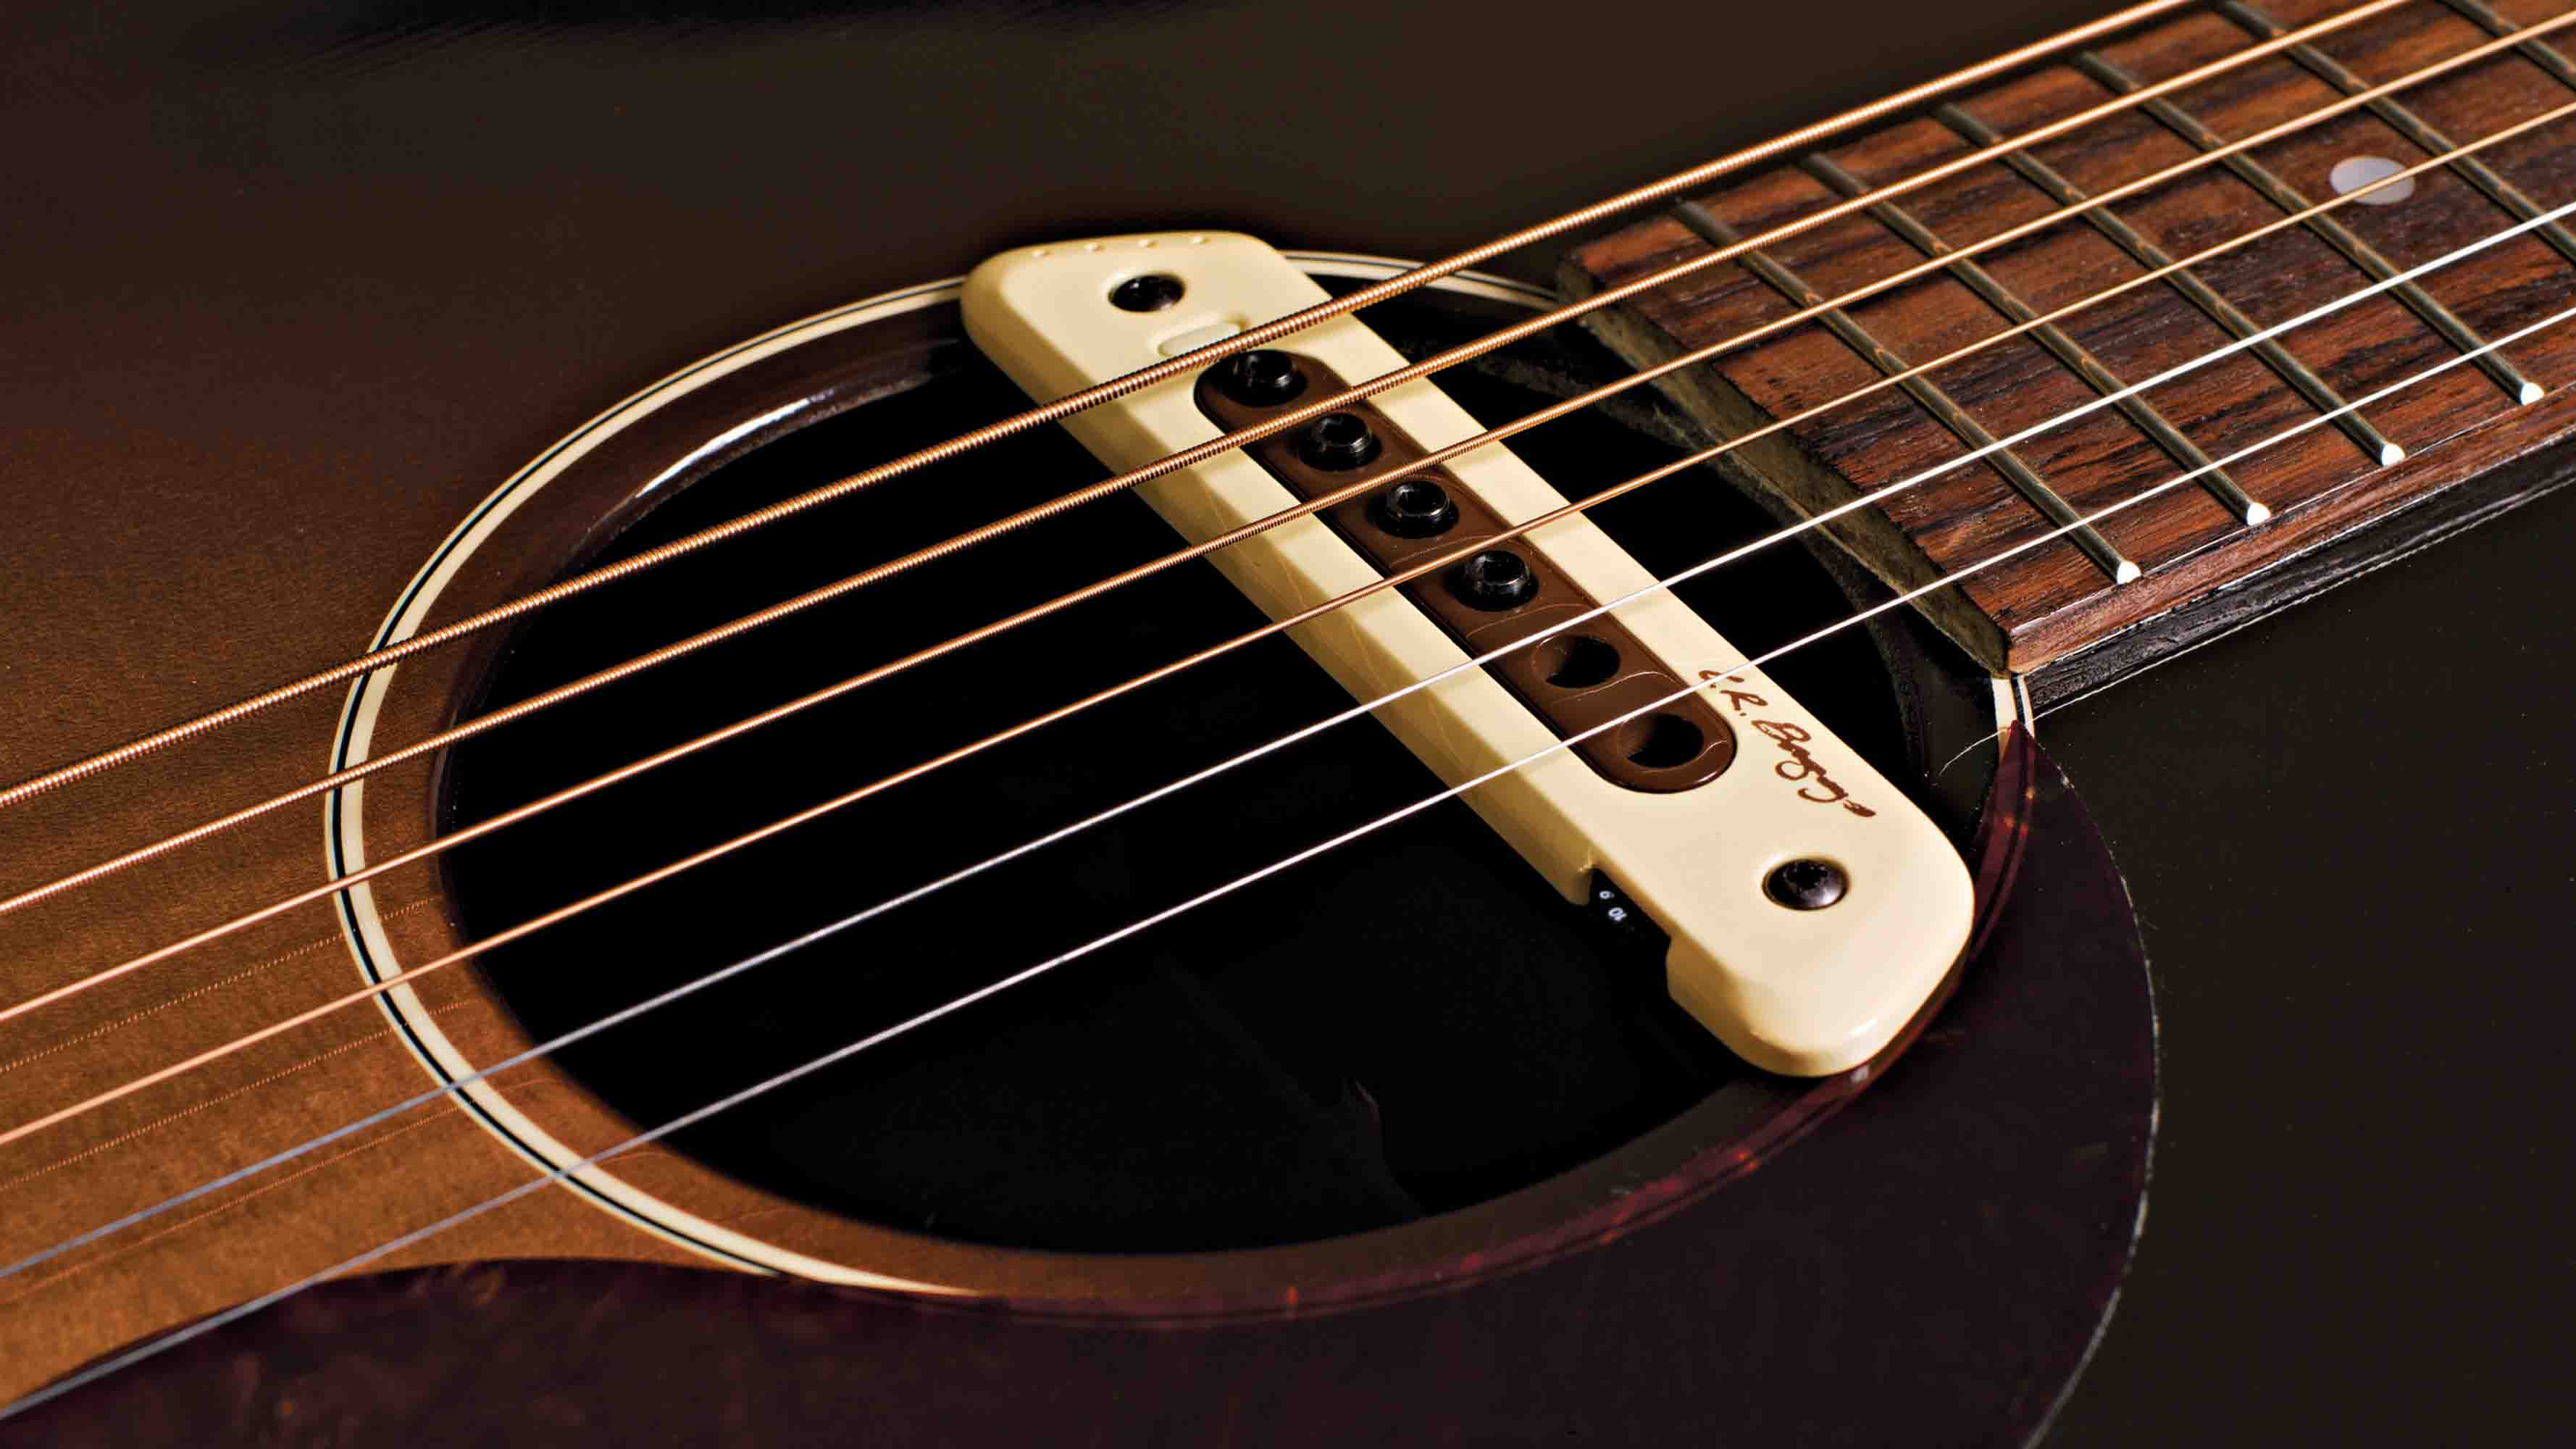 7 of the best acoustic guitar pickups | MusicRadar